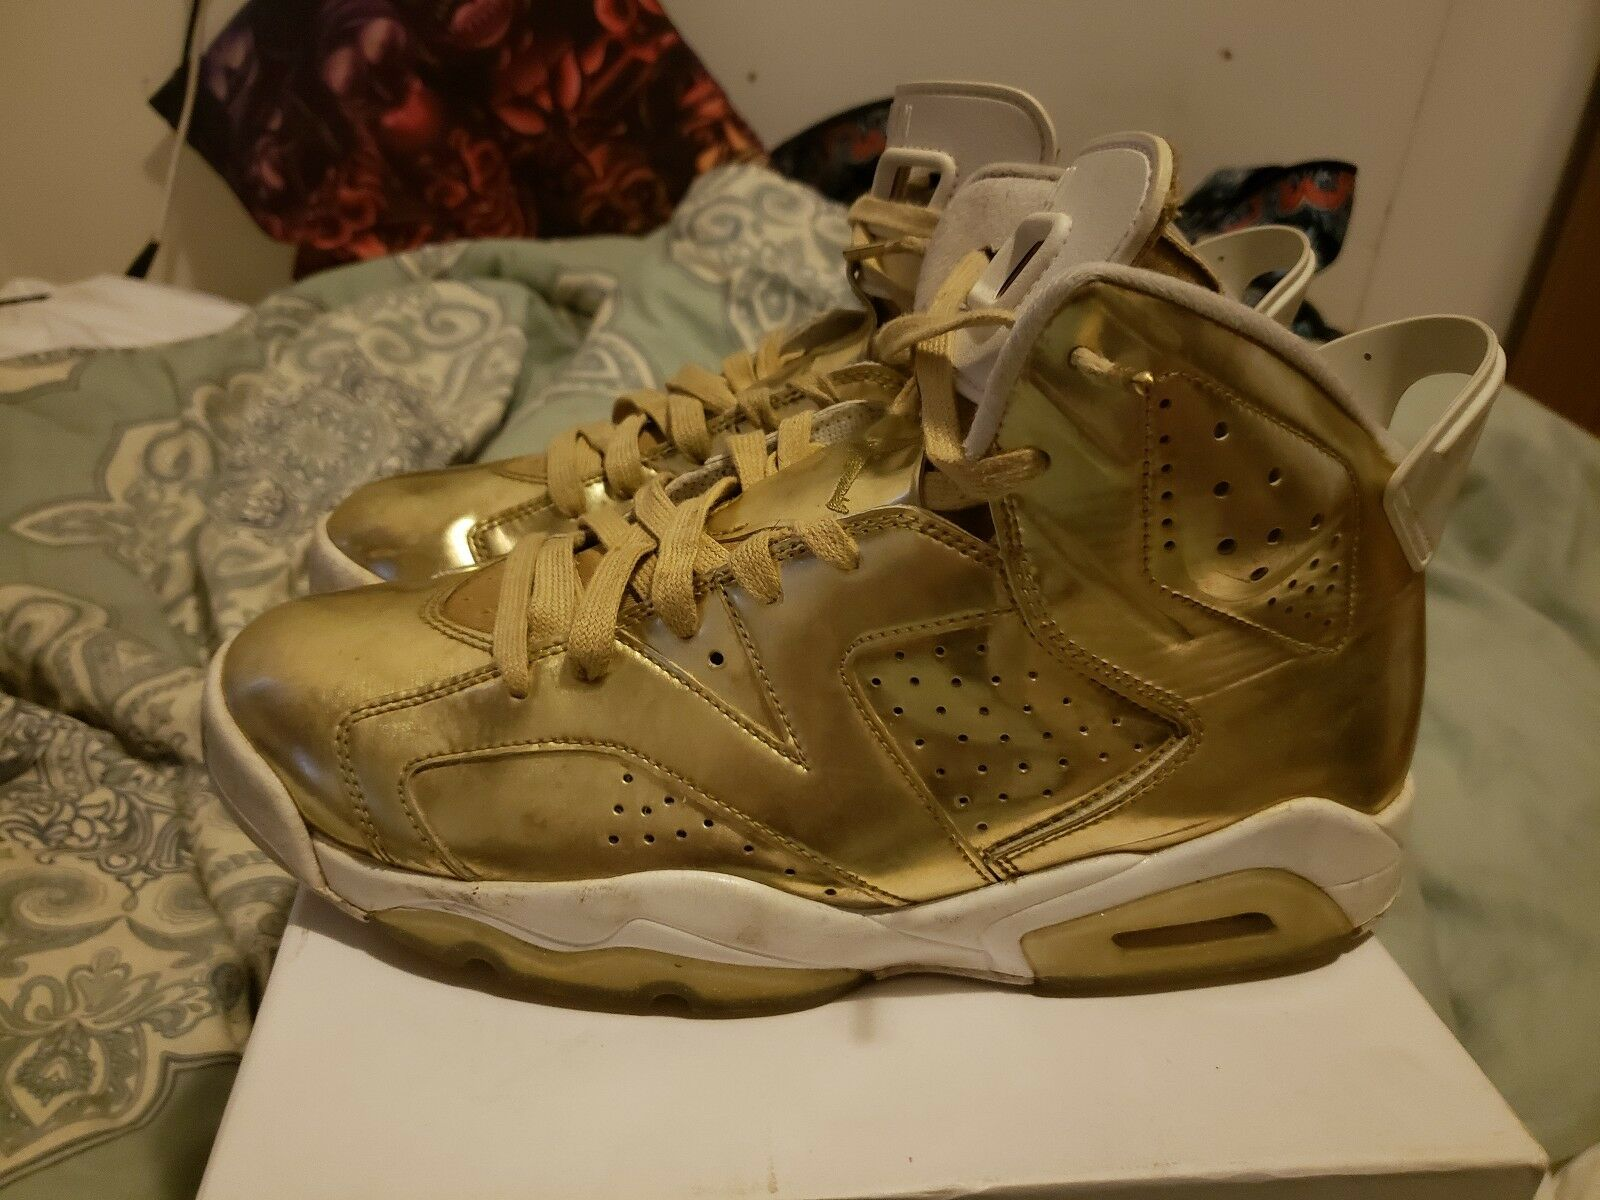 Nike Air Jordan 6 Pinnacle Metallic gold Size 10 pre owned